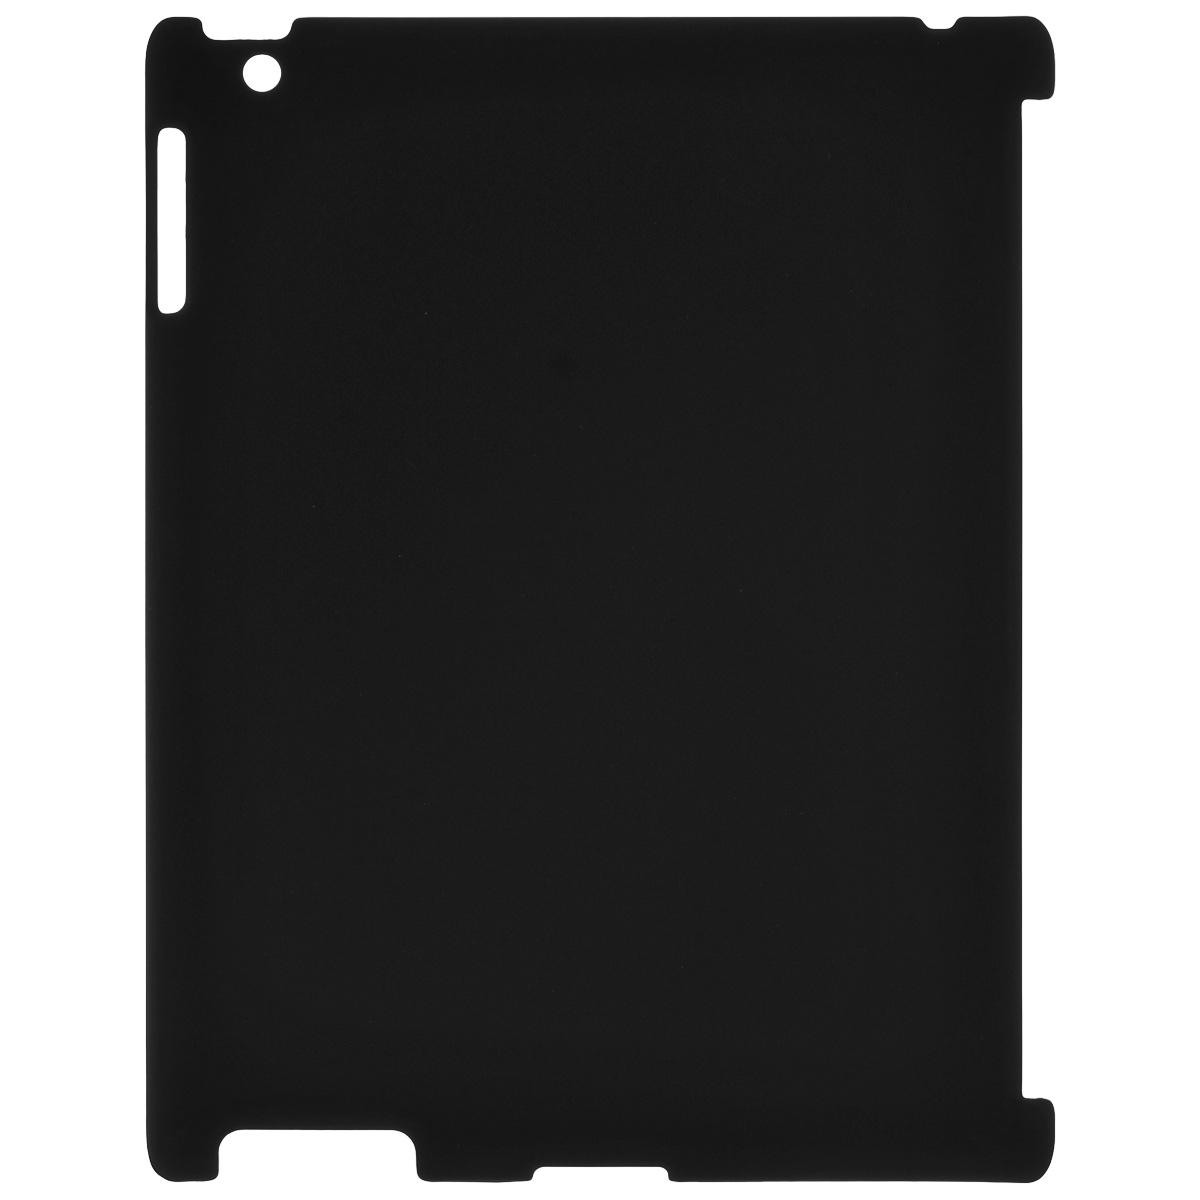 Black Horns чехол для iPad2, Black (BH-iD2201)